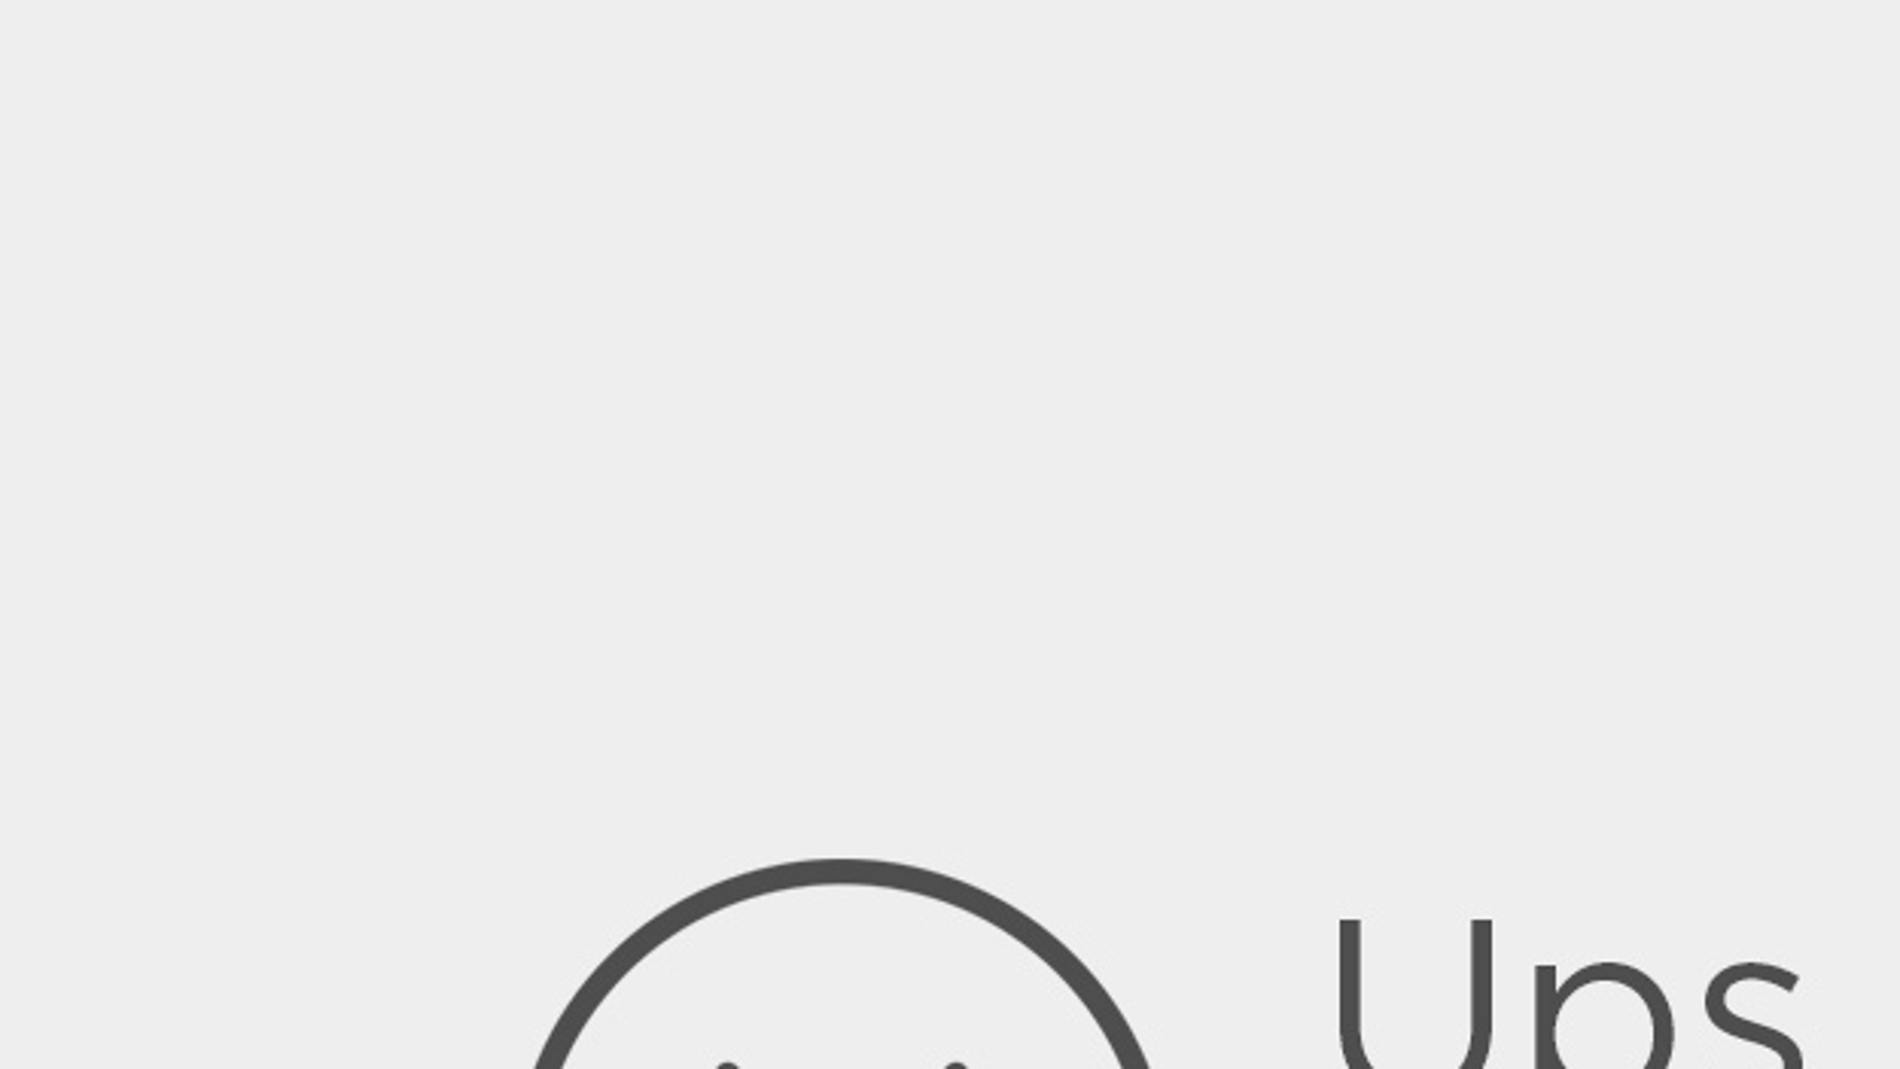 'Ted' ahora quiere ser padre